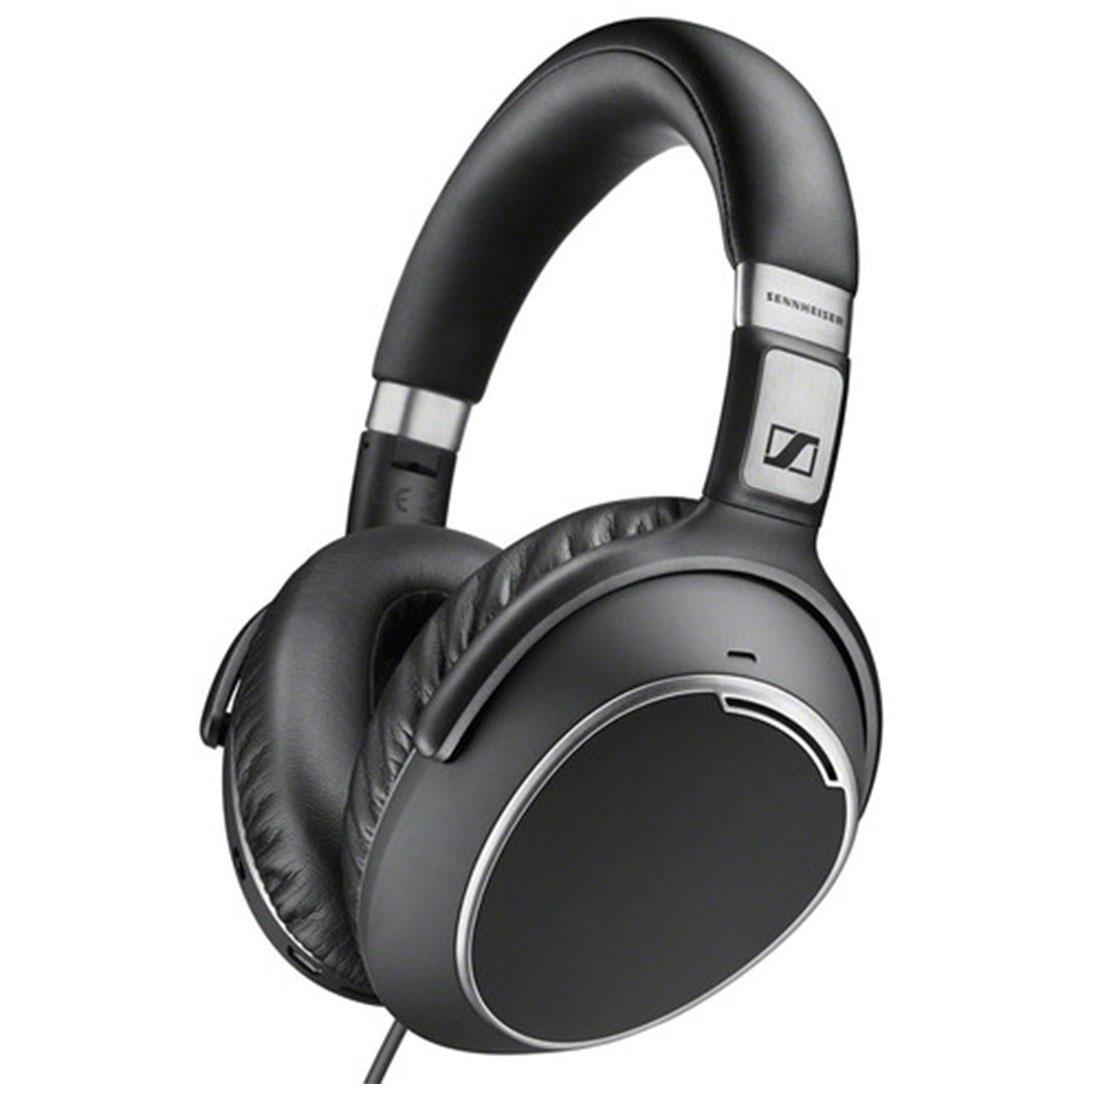 sennheiser pxc 480 noise cancelling headphone headphones 506518. Black Bedroom Furniture Sets. Home Design Ideas